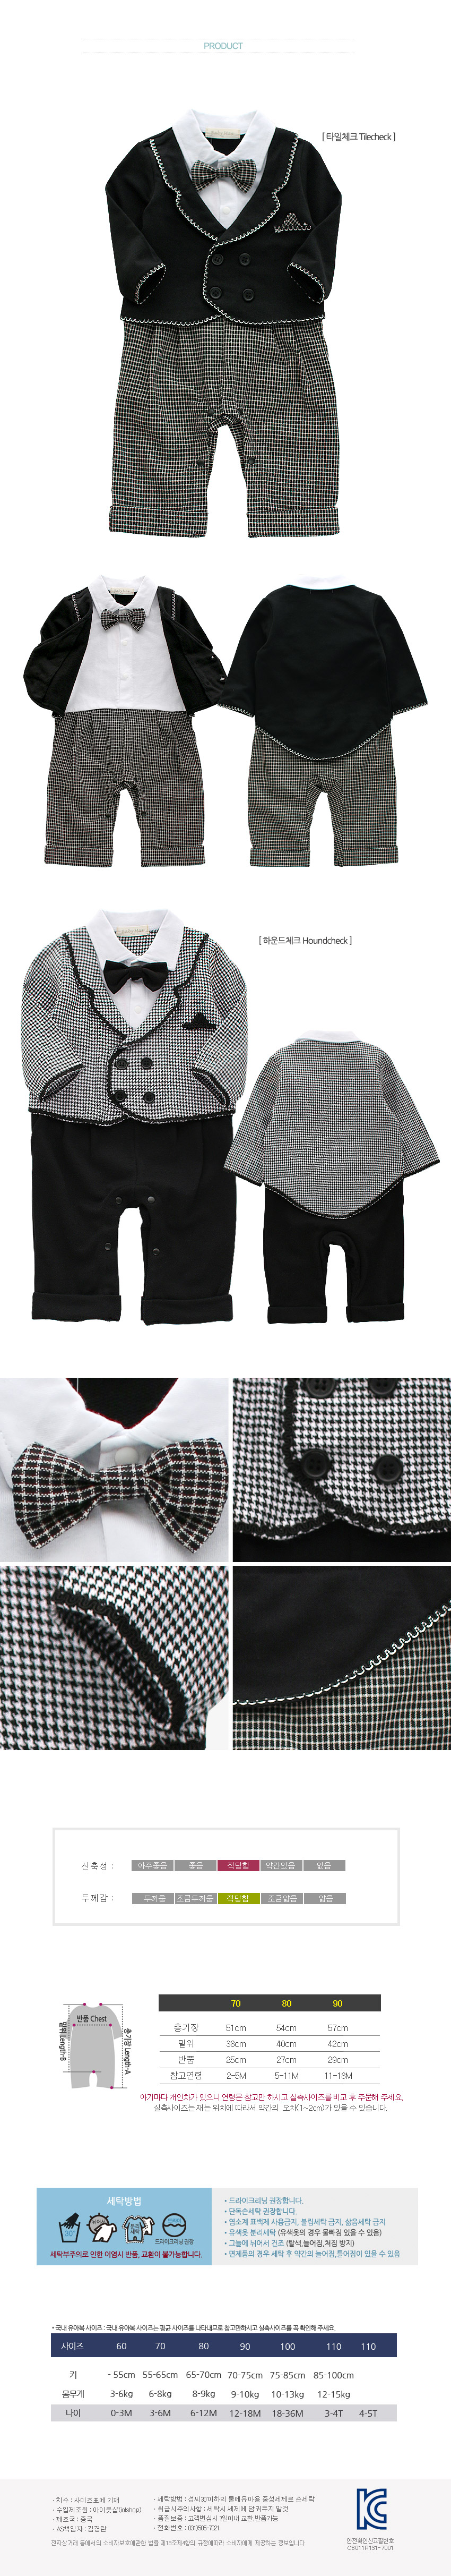 [ BABYMAX ] [ BABYMAX ]婴儿菲炫套连裤童装 1301